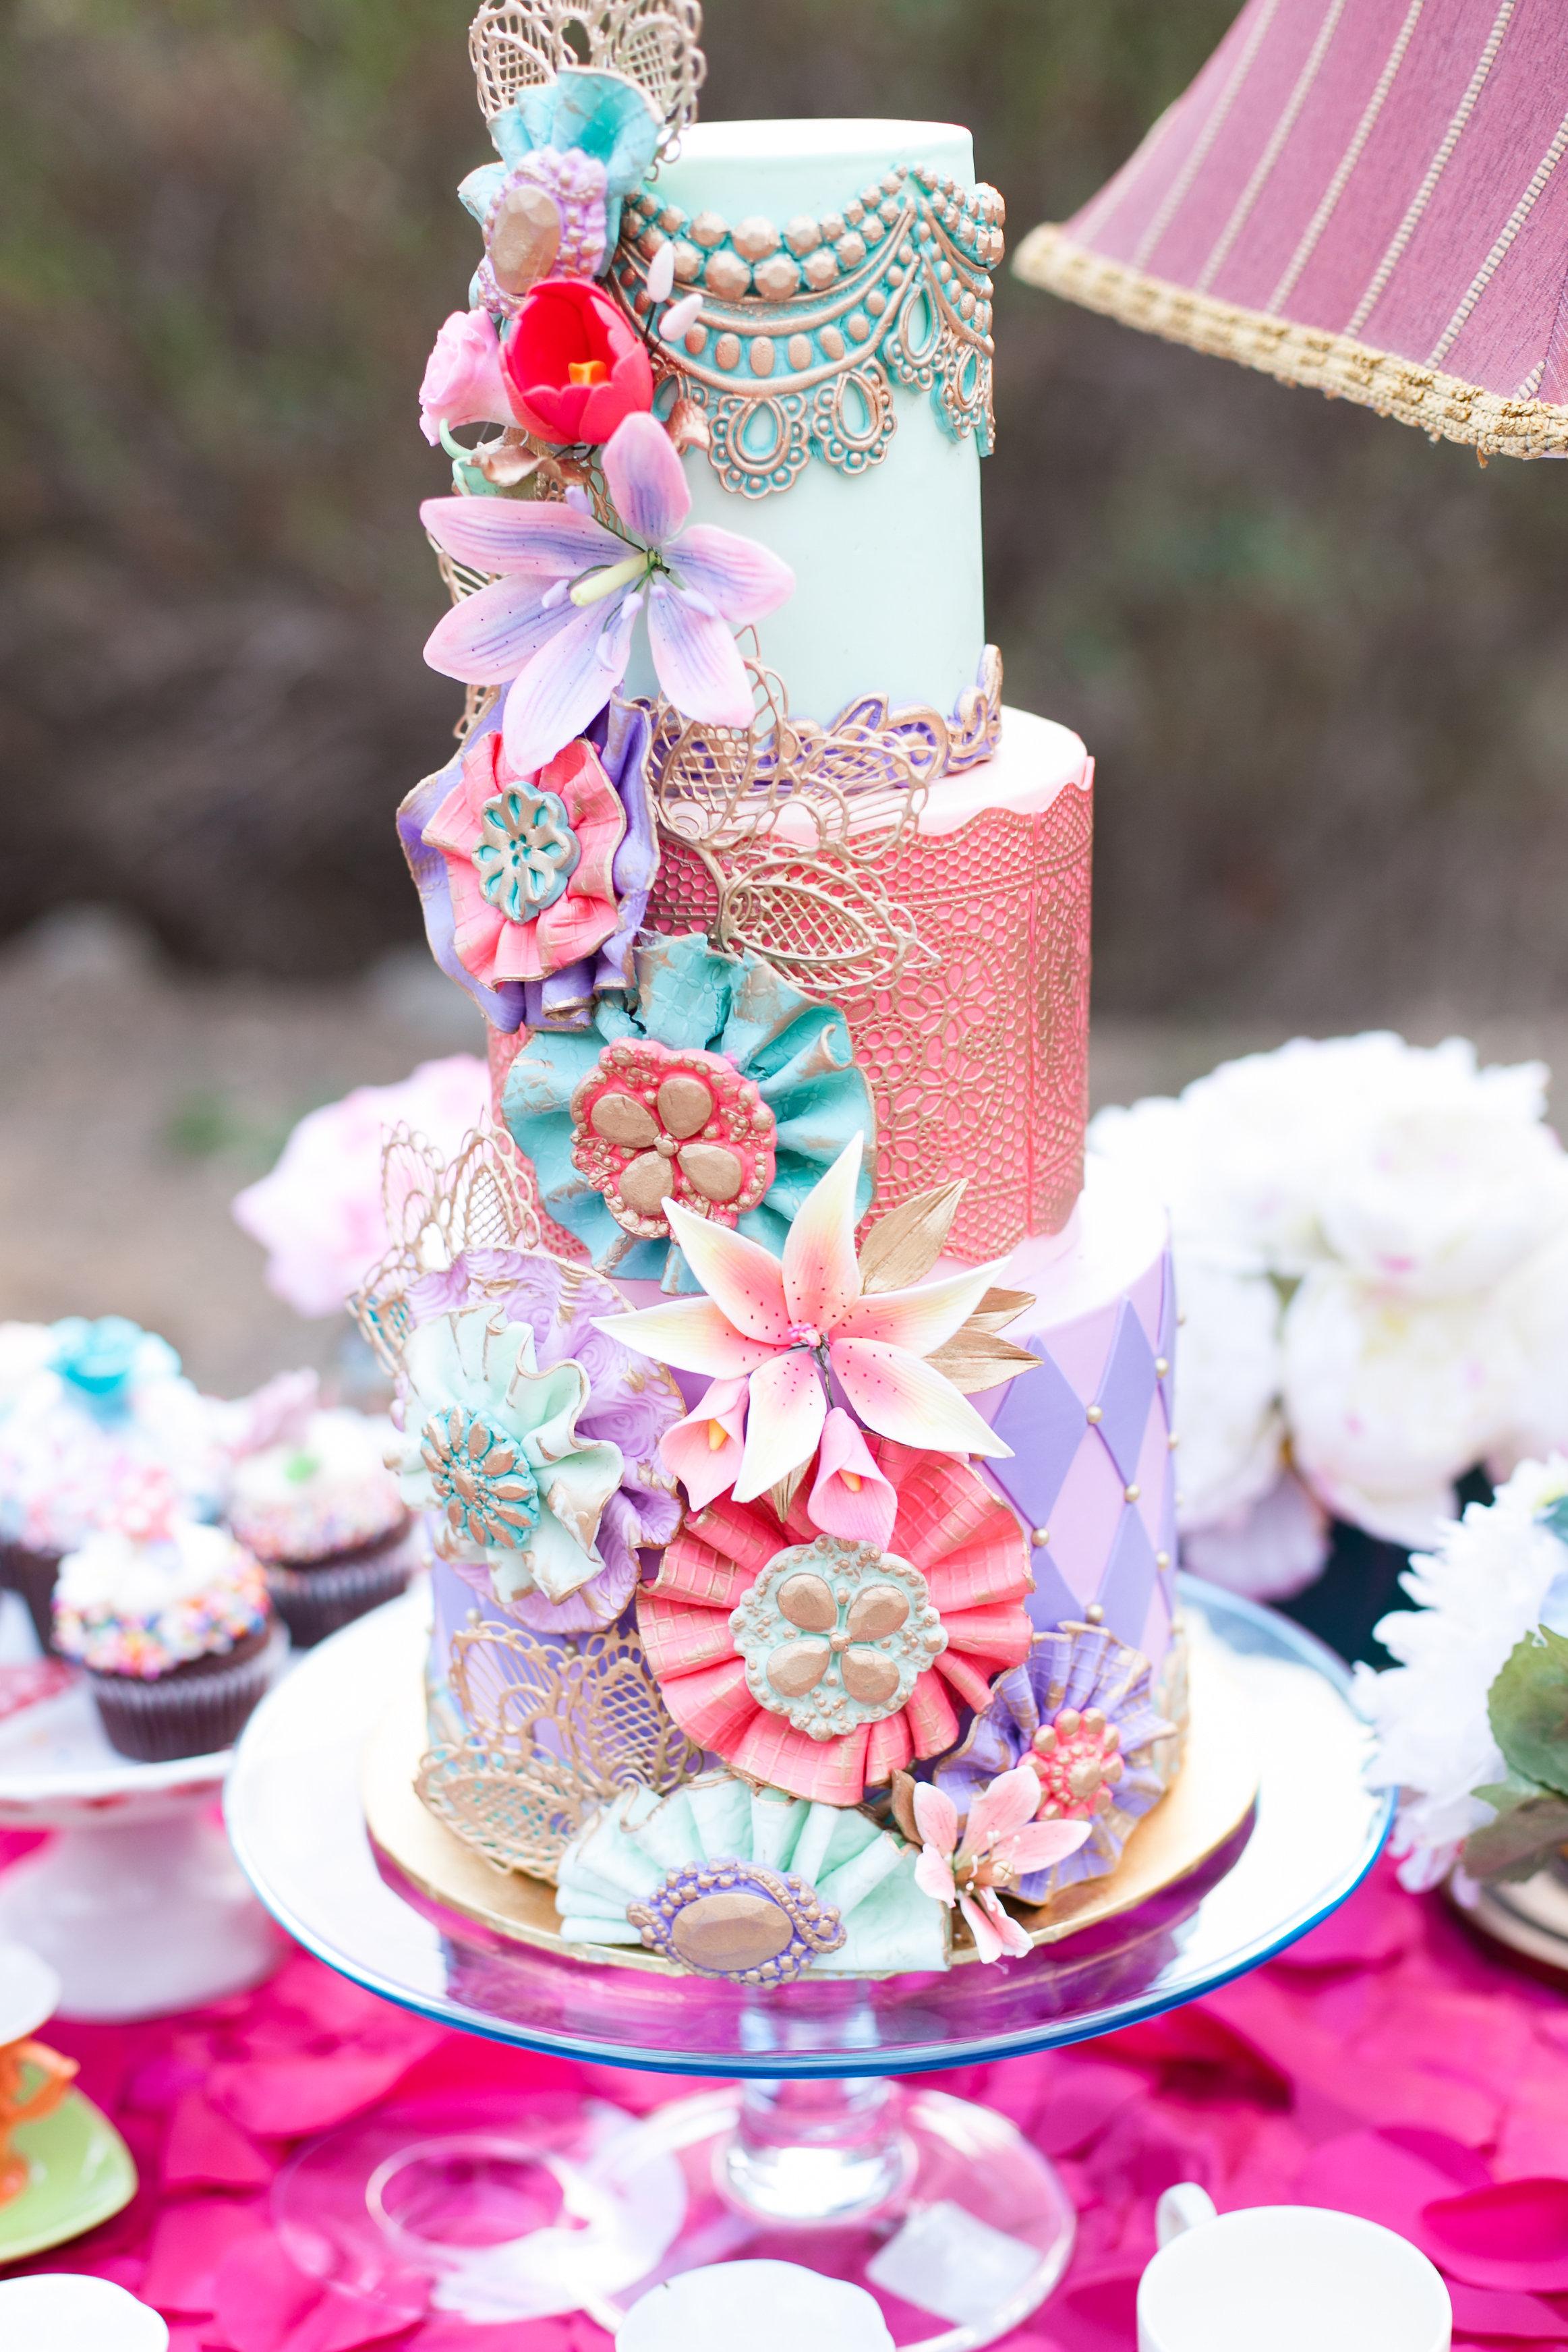 Bohemian themed fondant wedding cake